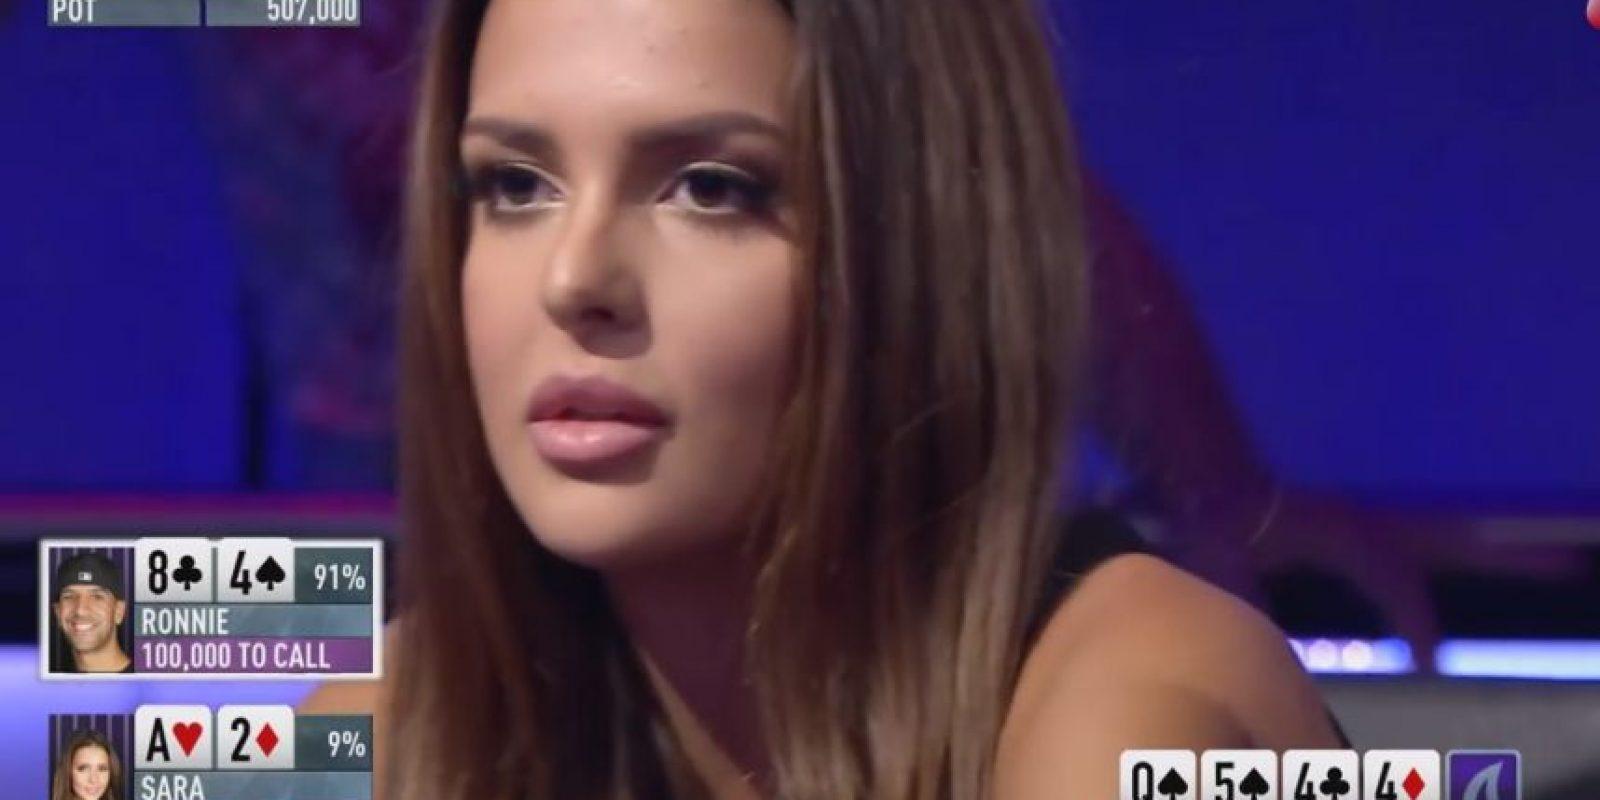 Sara Chafak le ganó la partida al reconocido Ronnie Bardah Foto:Youtube: PokerStars